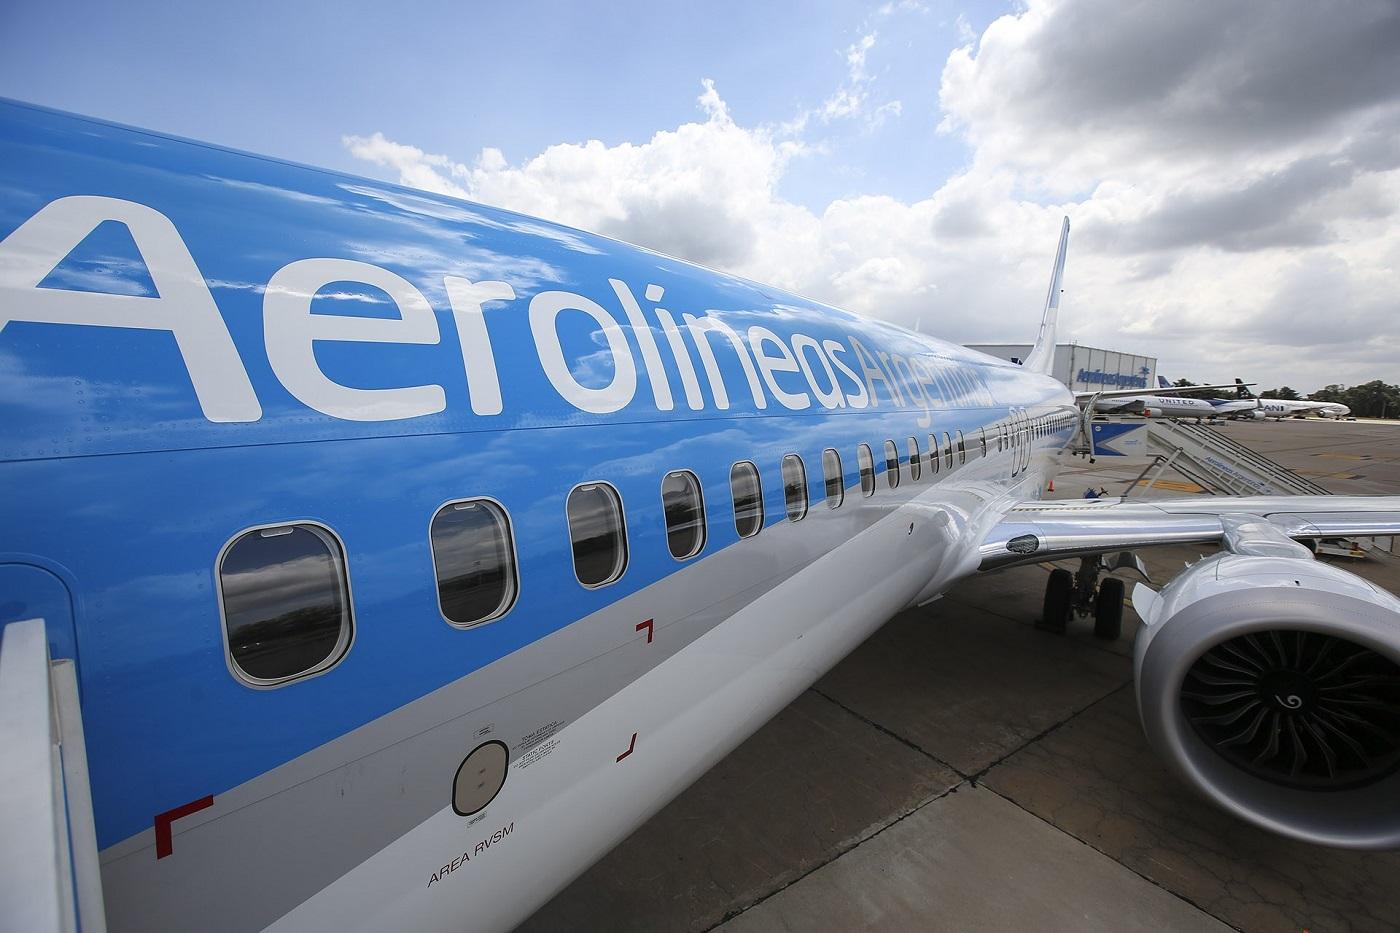 oferta aerolineas argentinas roma buenos aires